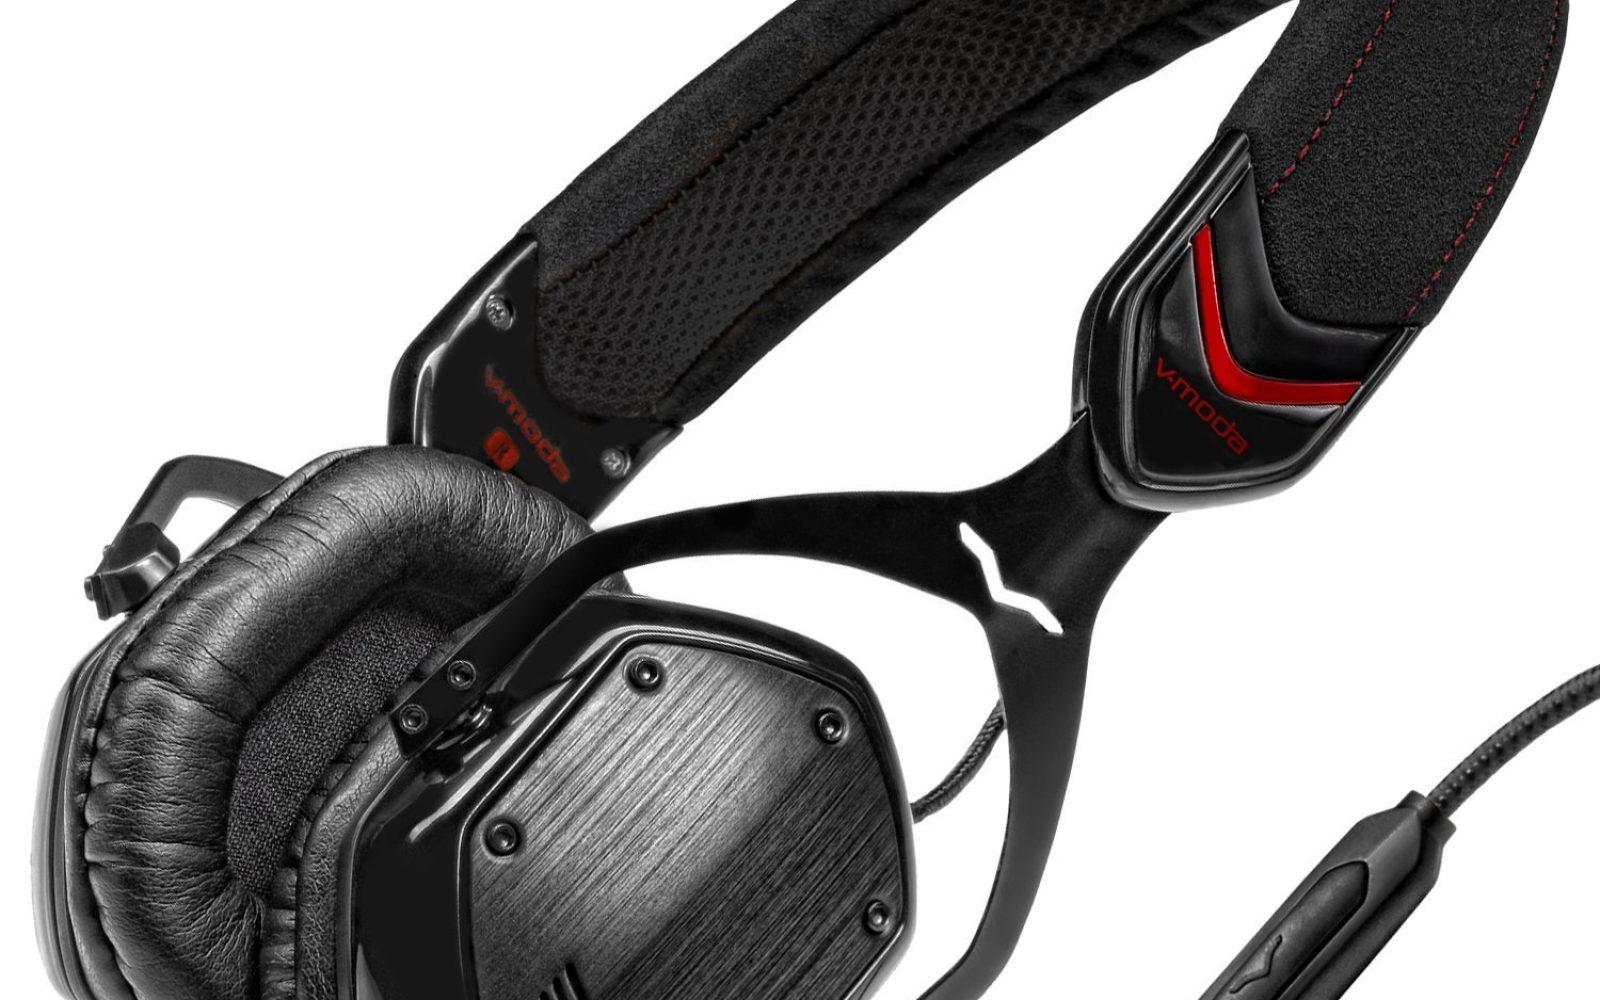 036a4ca4ad8 Headphones: V-MODA On-Ears $80 (Orig. $230), Beats Solo 2 & Studios (open  box) from $110 (Orig. $200+), more